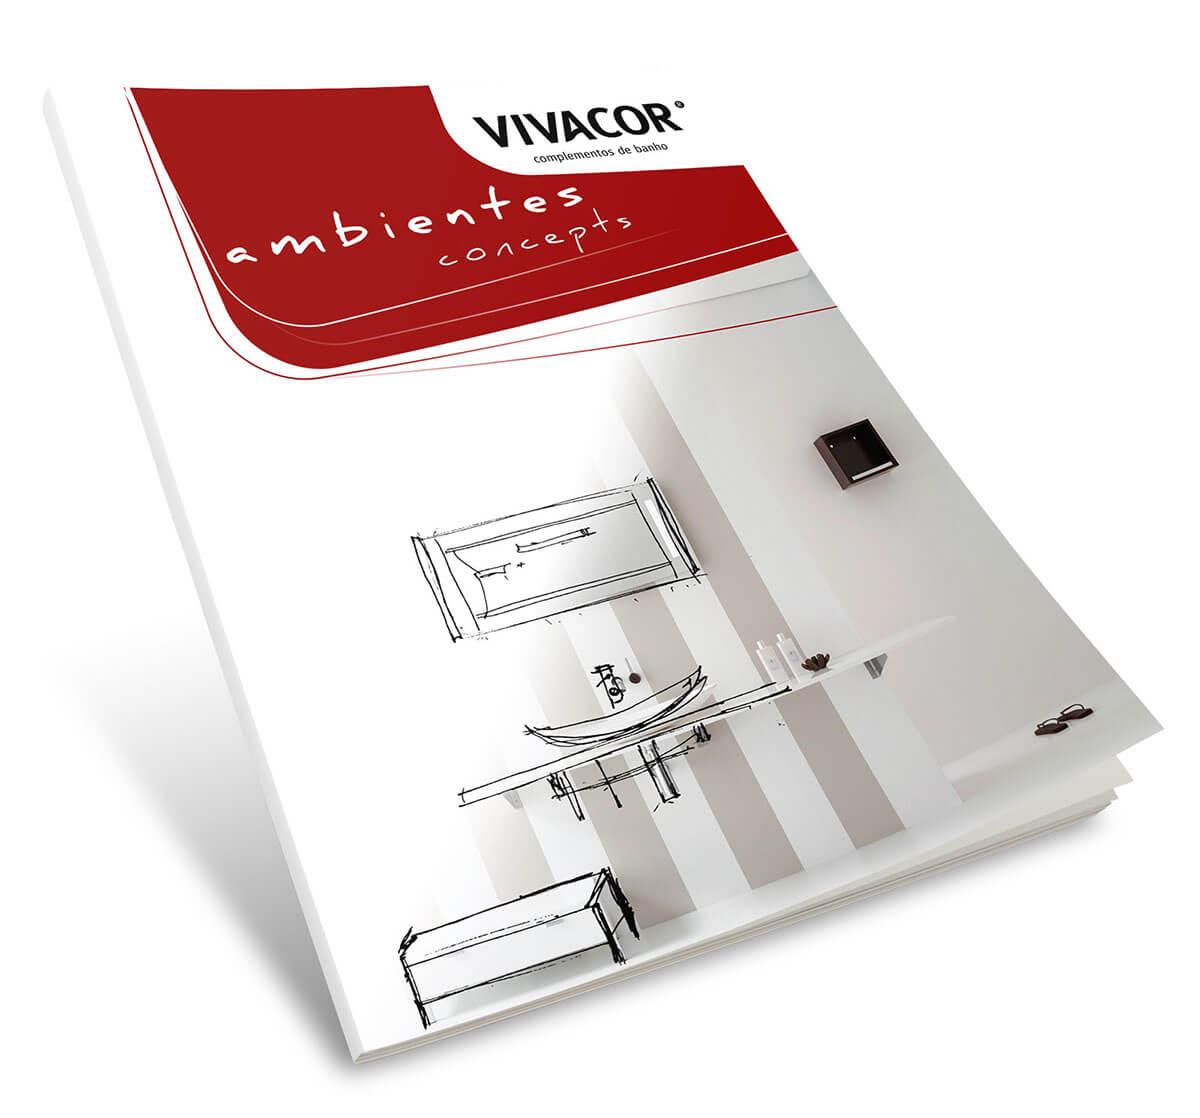 Vivacor -    Way2Start - Design & Digital Agency